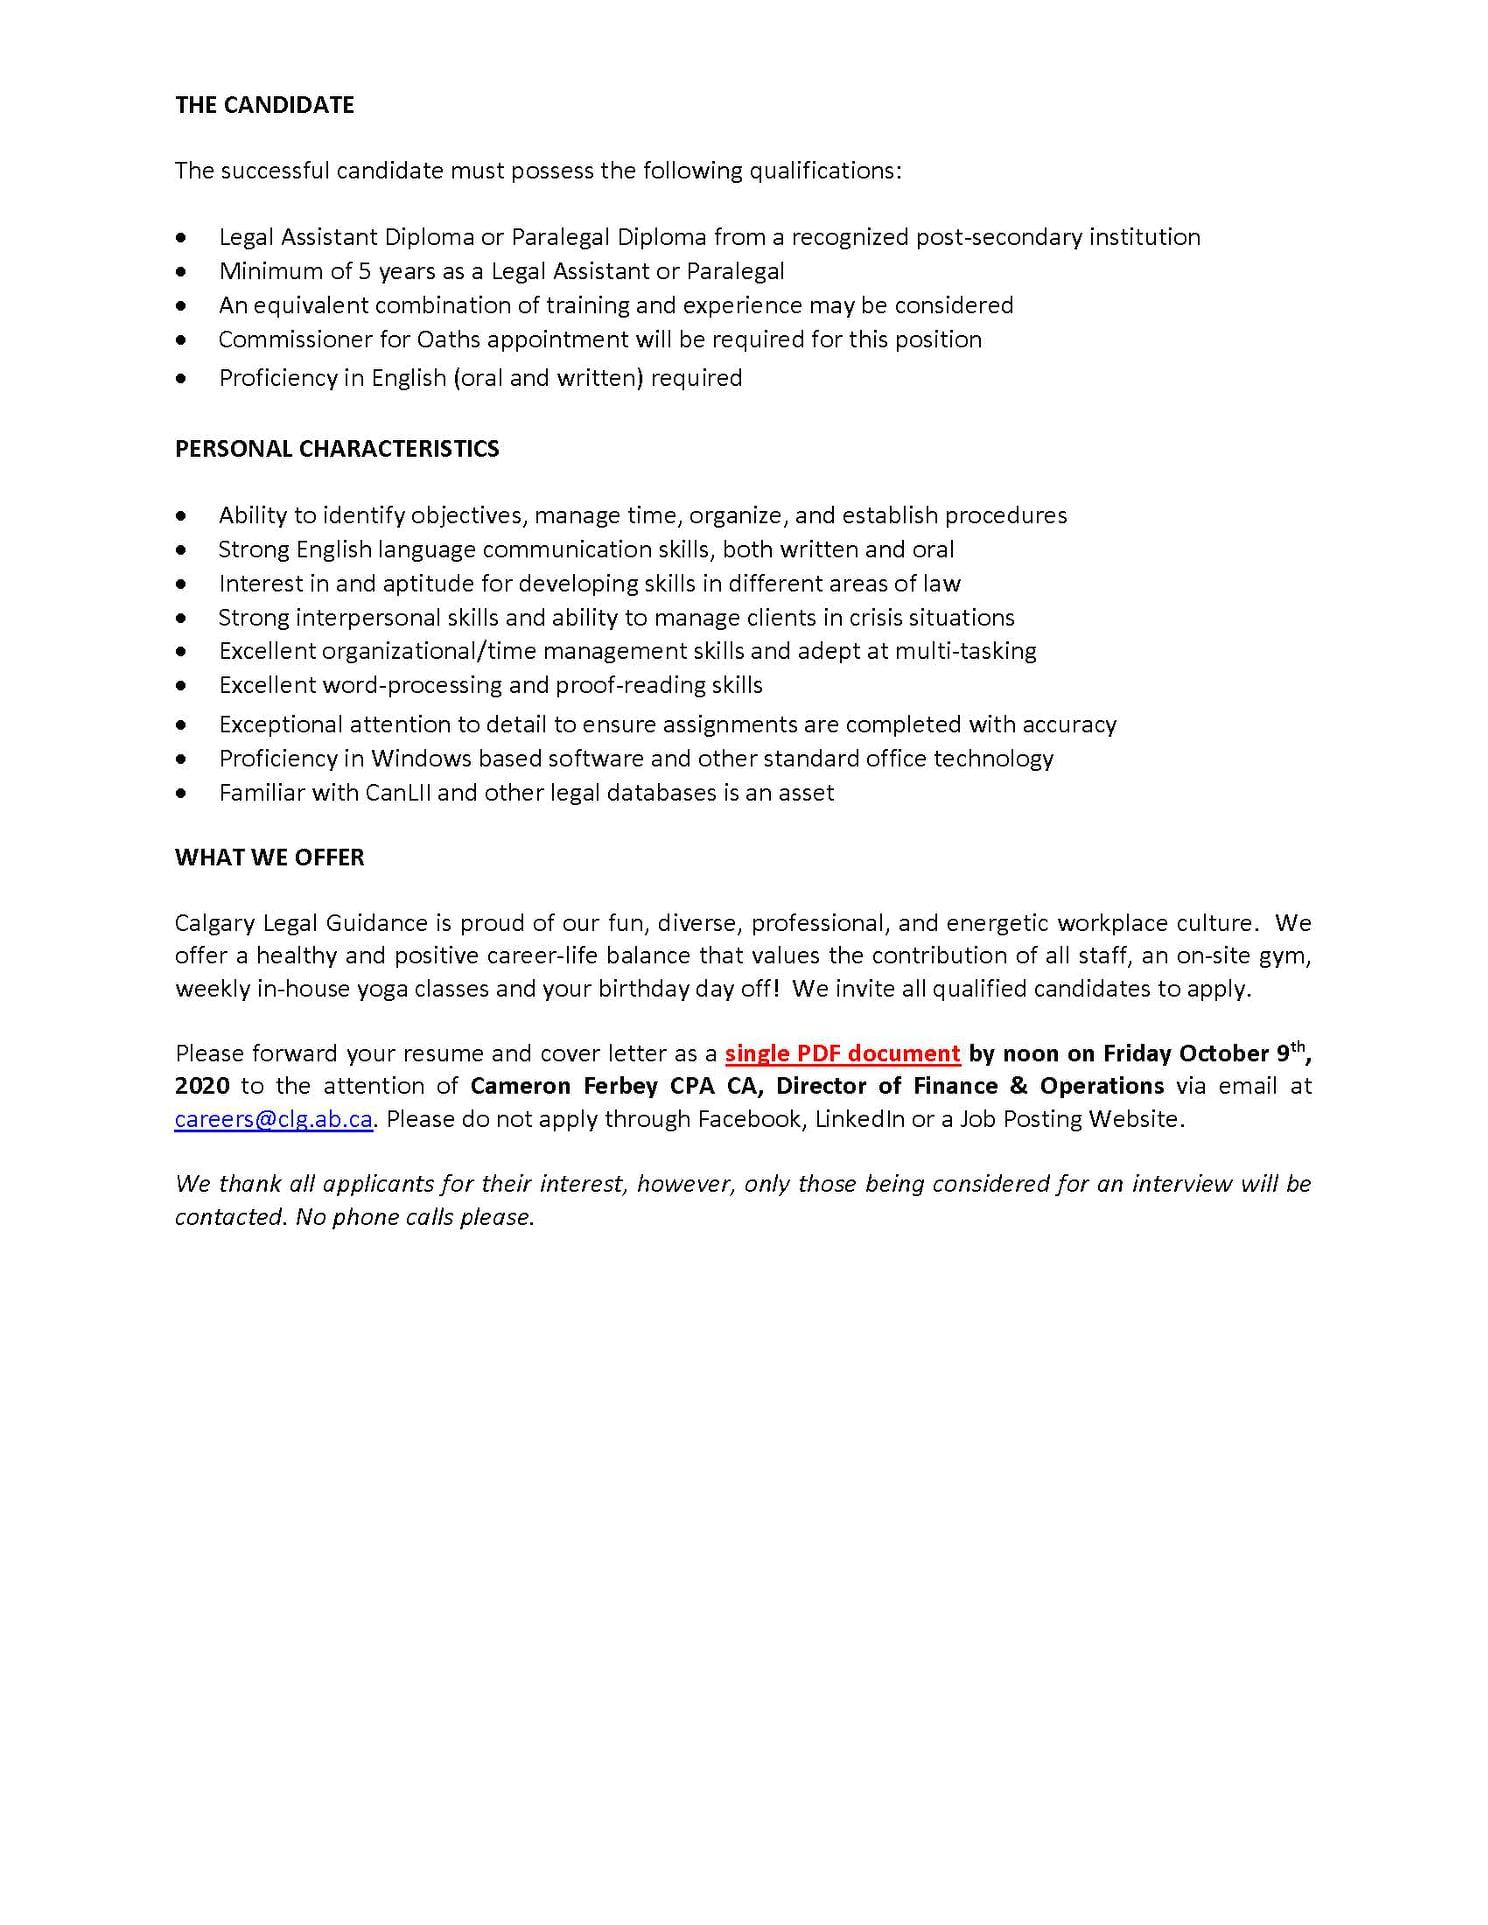 job posting- pg 2